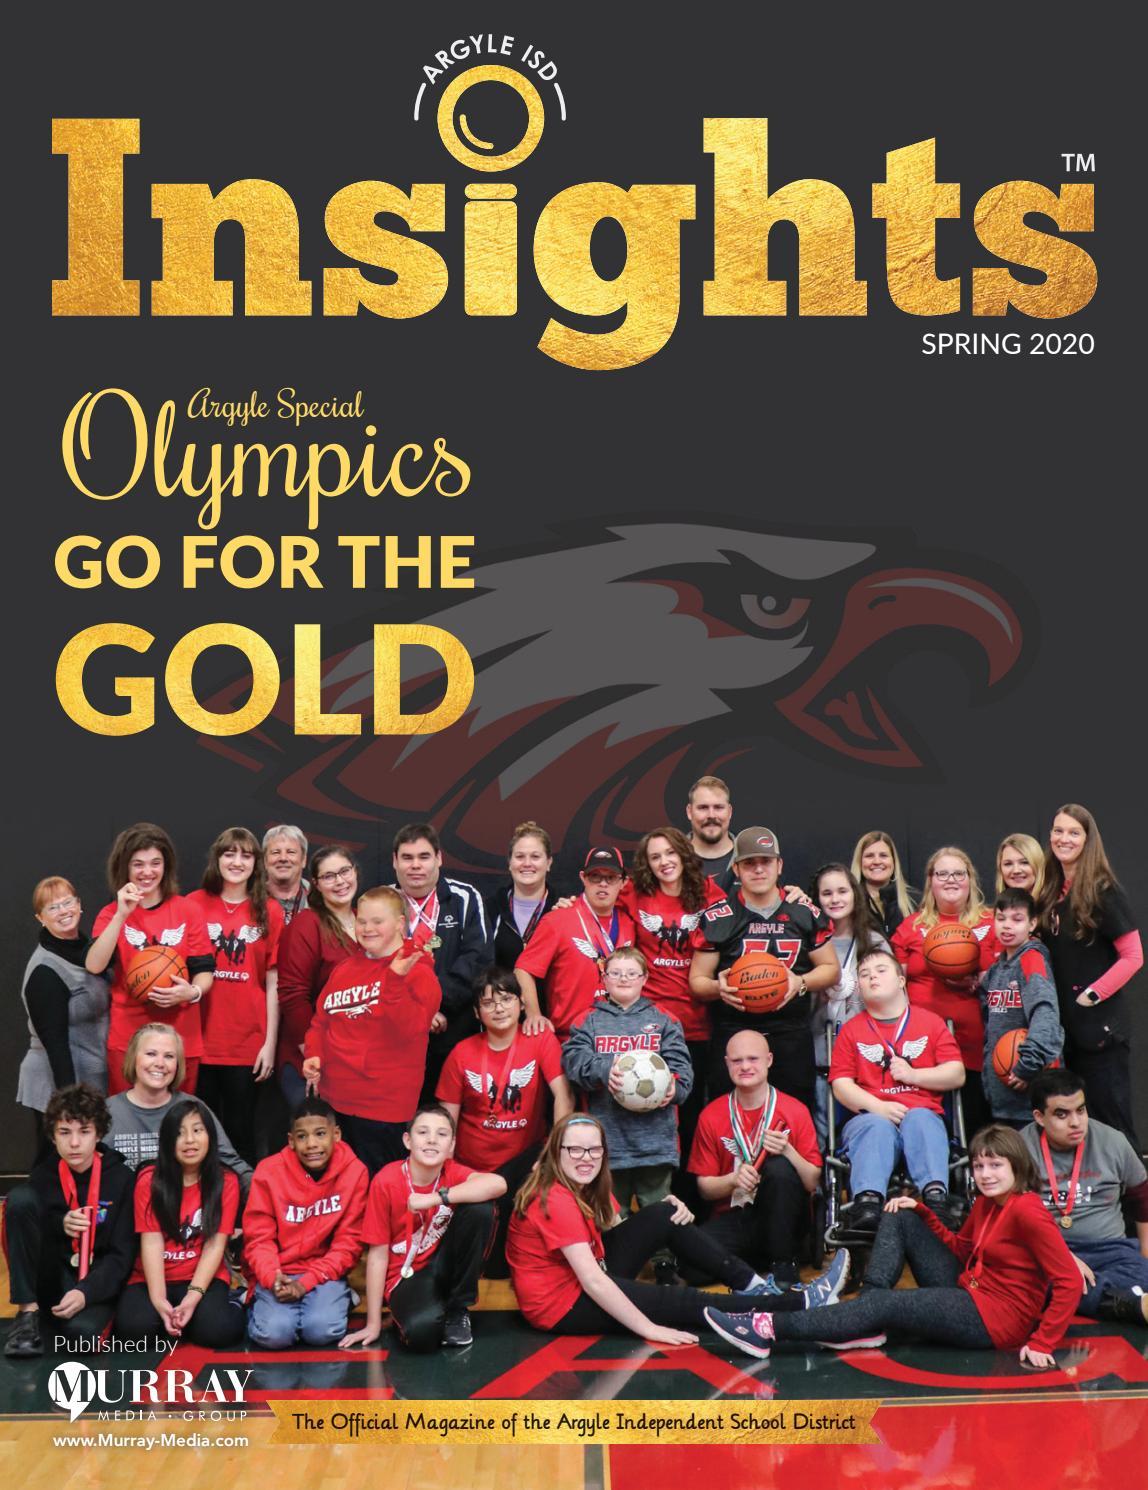 Lubbock Isd Calendar 2022 23.Argyle Isd Insights Magazine Spring 2020 By Murray Media Group Issuu